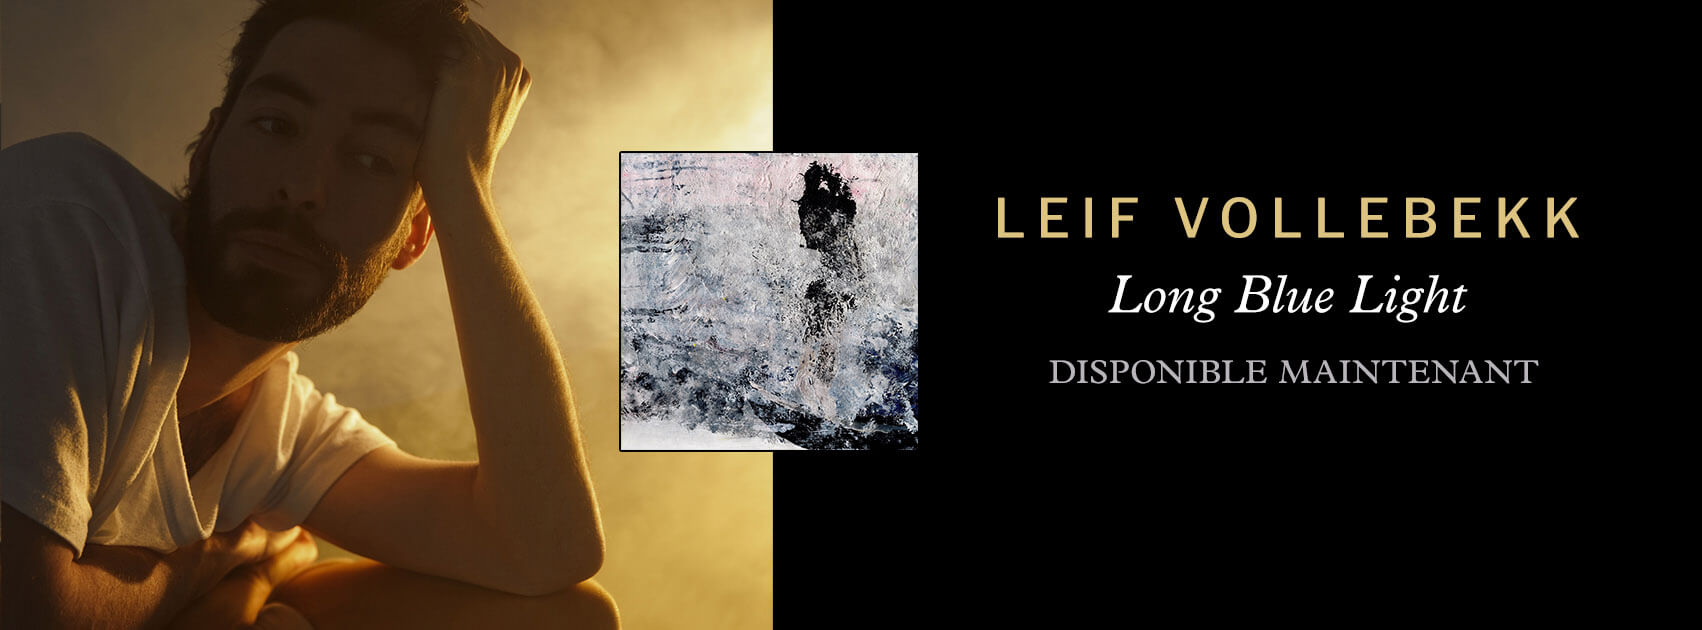 Leif-LongBlueLight-SCRWebsite-FR-maintenant